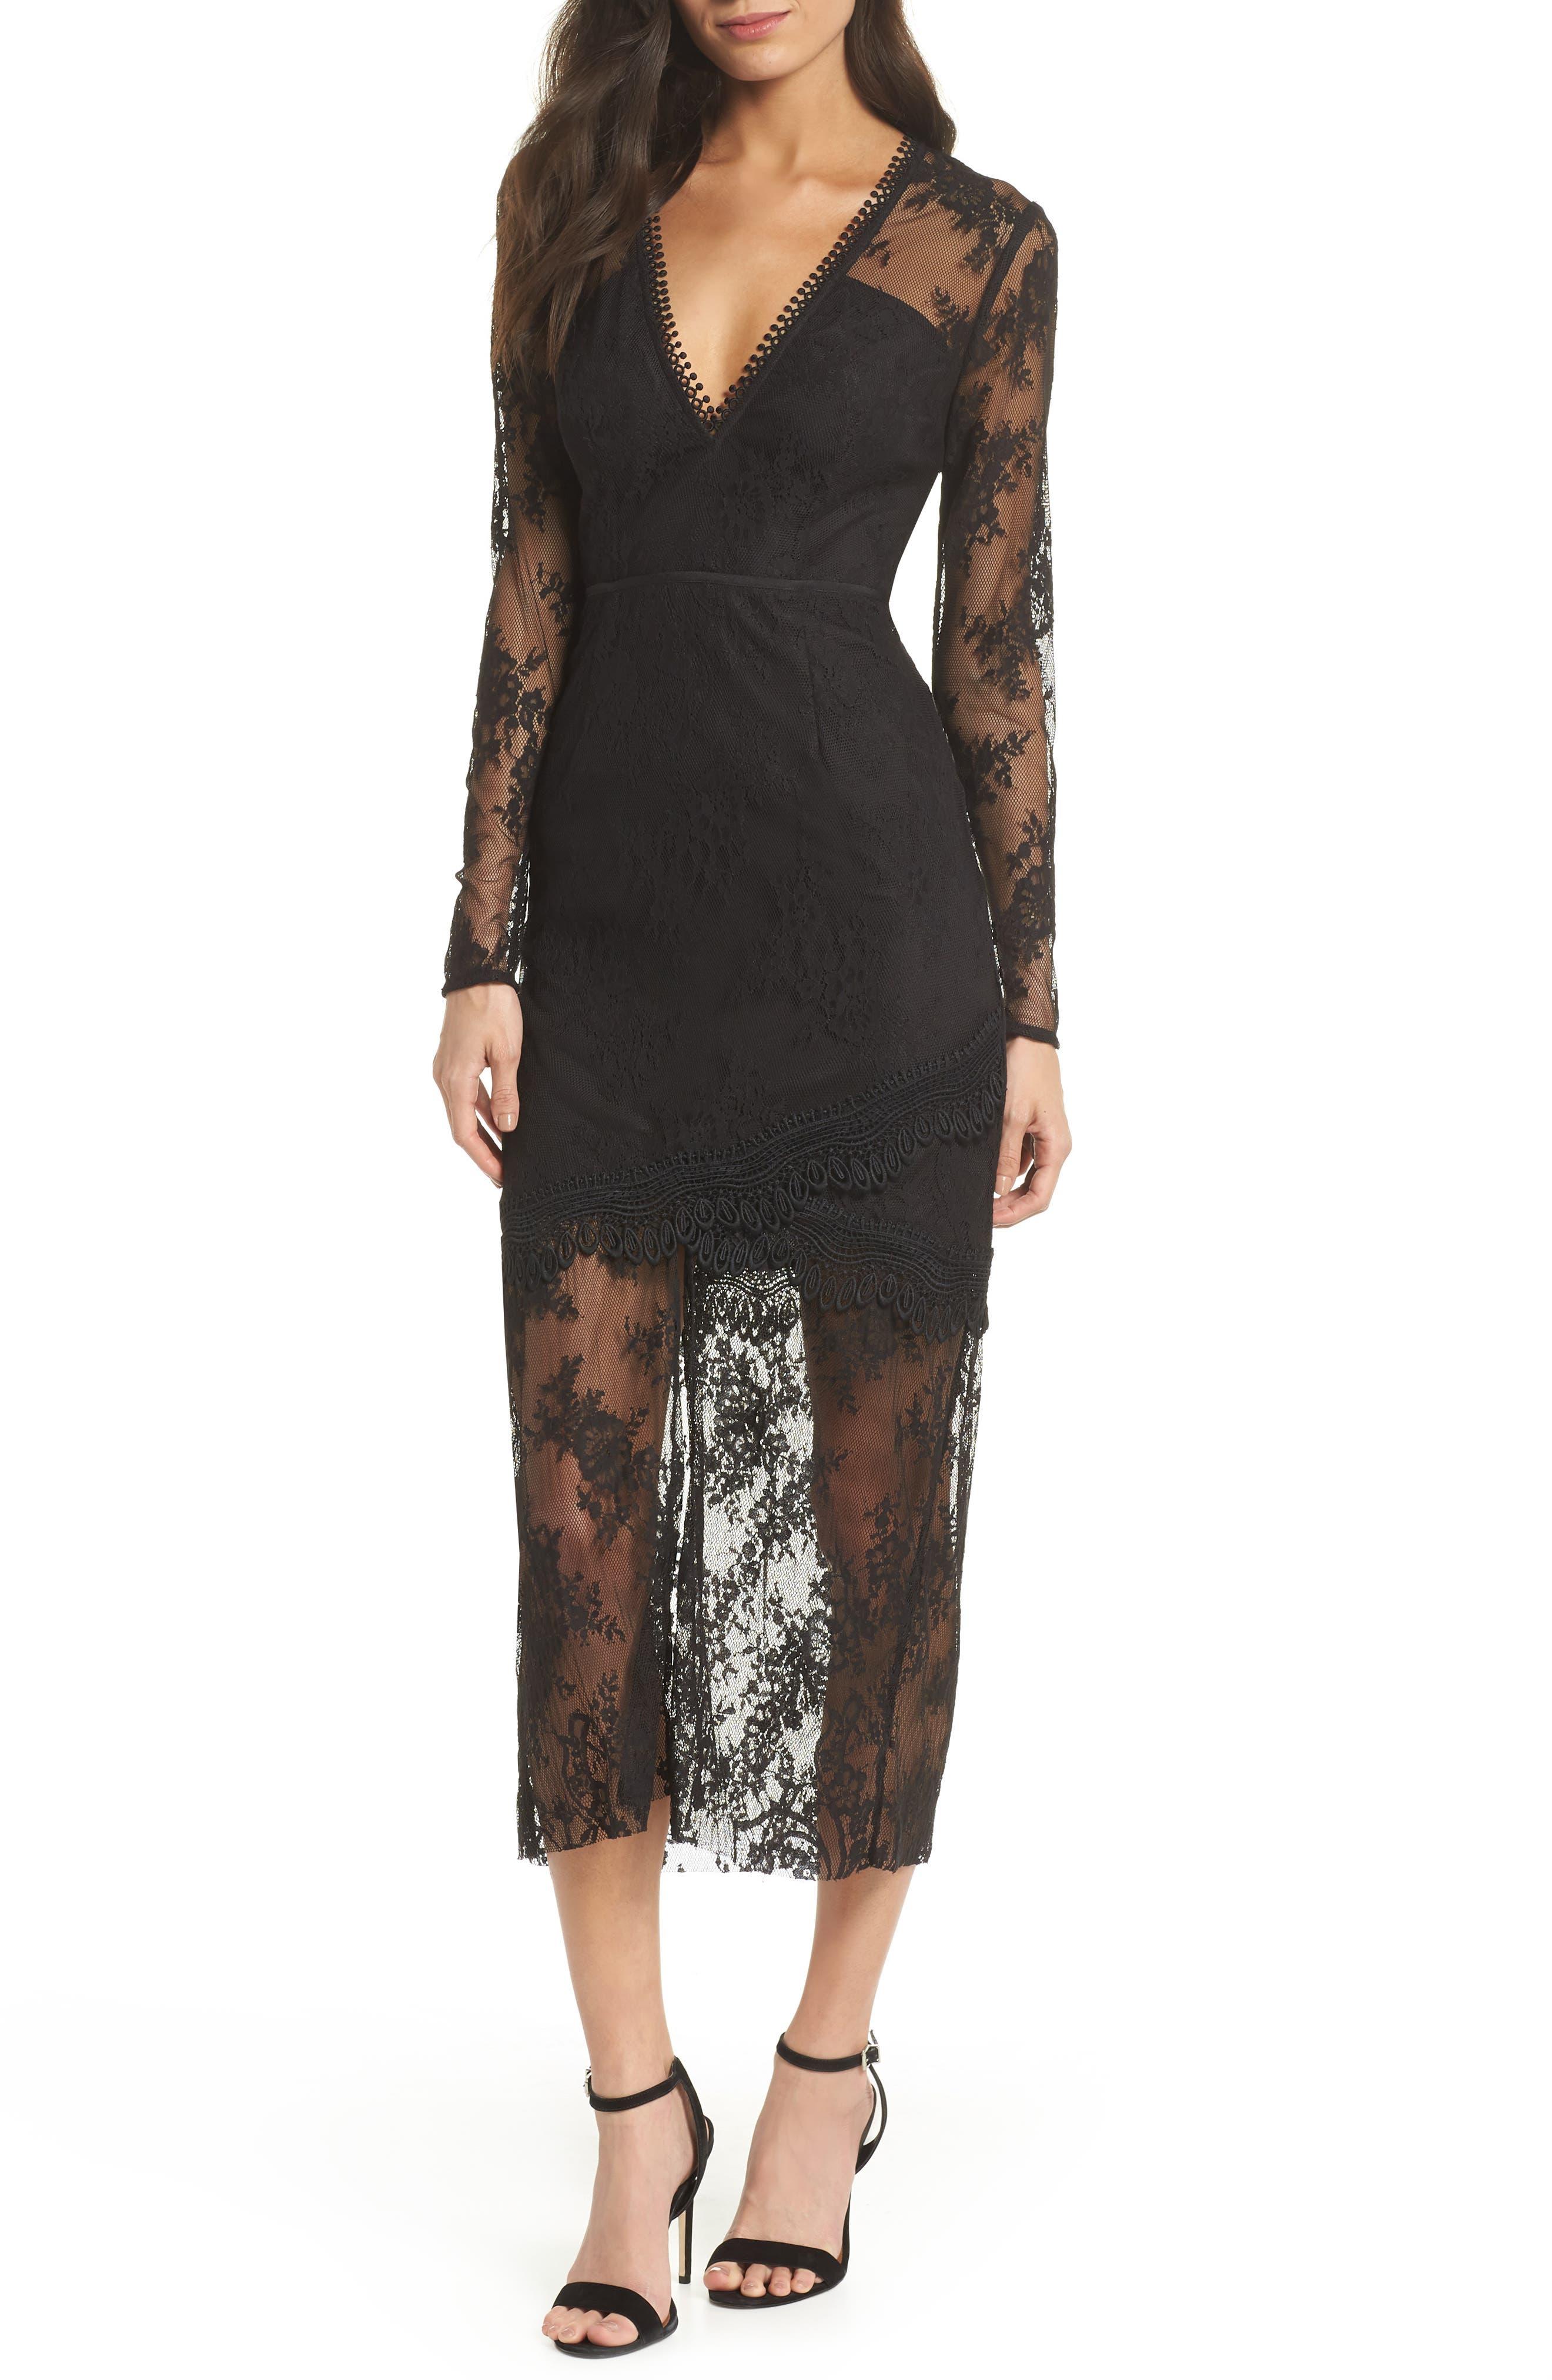 True Chemistry Lace Sheath Dress,                             Main thumbnail 1, color,                             001